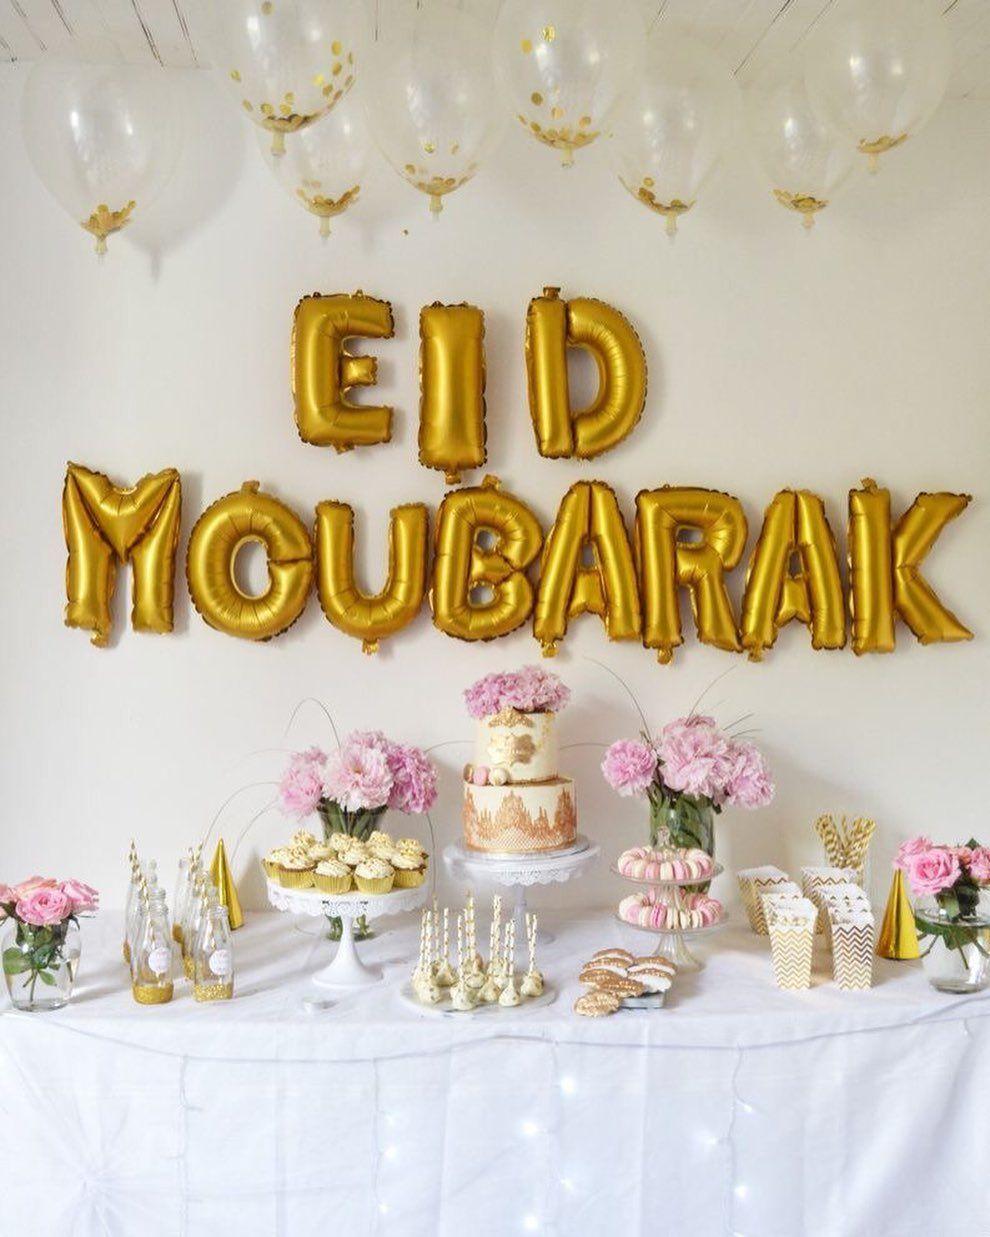 Food Party كيك تنسيق حفلات جلسات حفلات طاولات استقبال افكار Idea Home Sweets حلويات زواج Wedding تصميم Desig Eid Decoration Eid Sweets Eid Cake